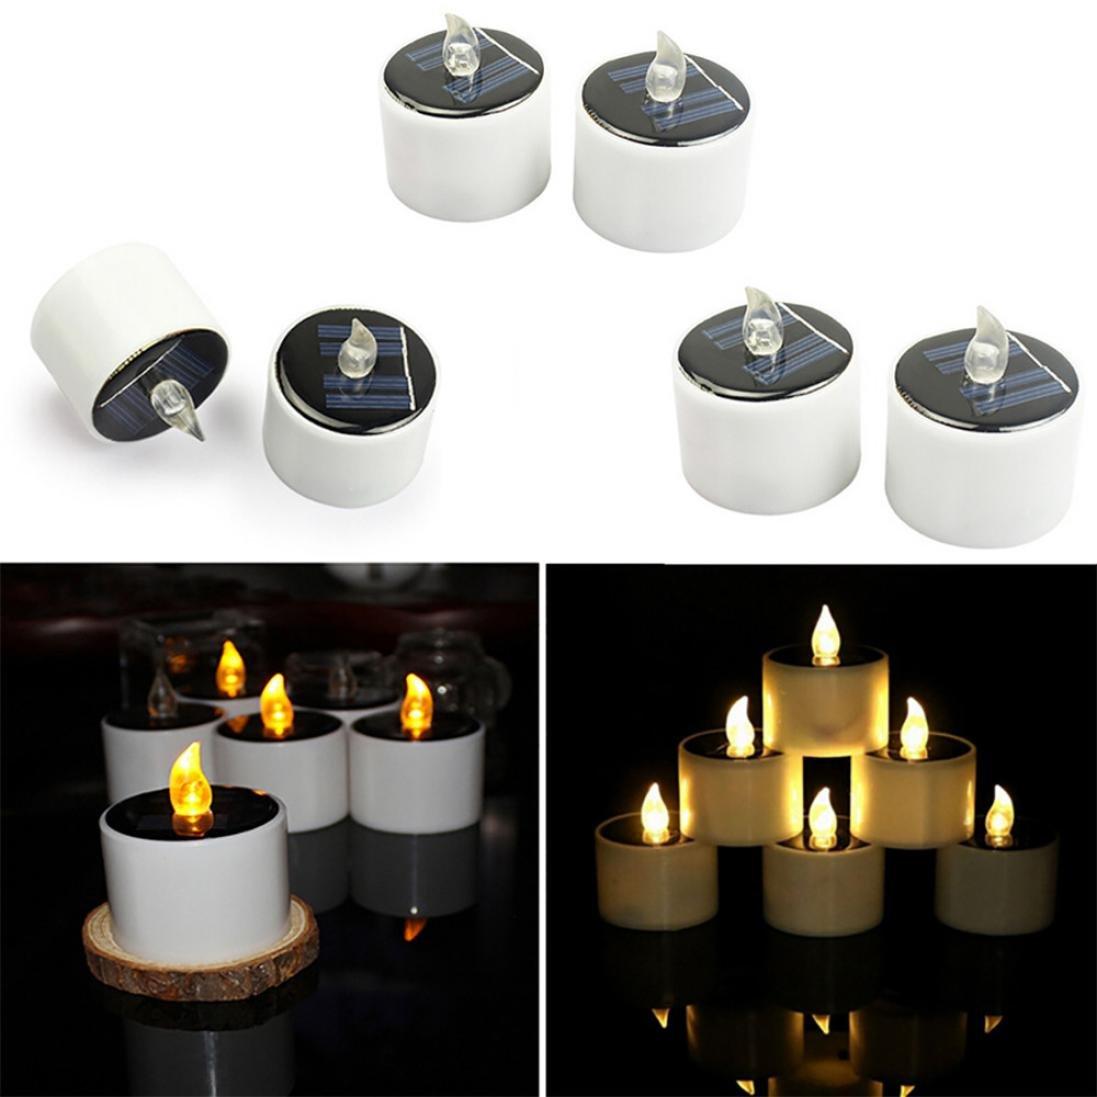 Fheaven (TM) 1PC/6Pcs Solar Powered LED Candles Flameless Electronic Solar LED Tea Lights Lamp for Halloween Christmas wedding,birthday and home Decoration. (6PCS)